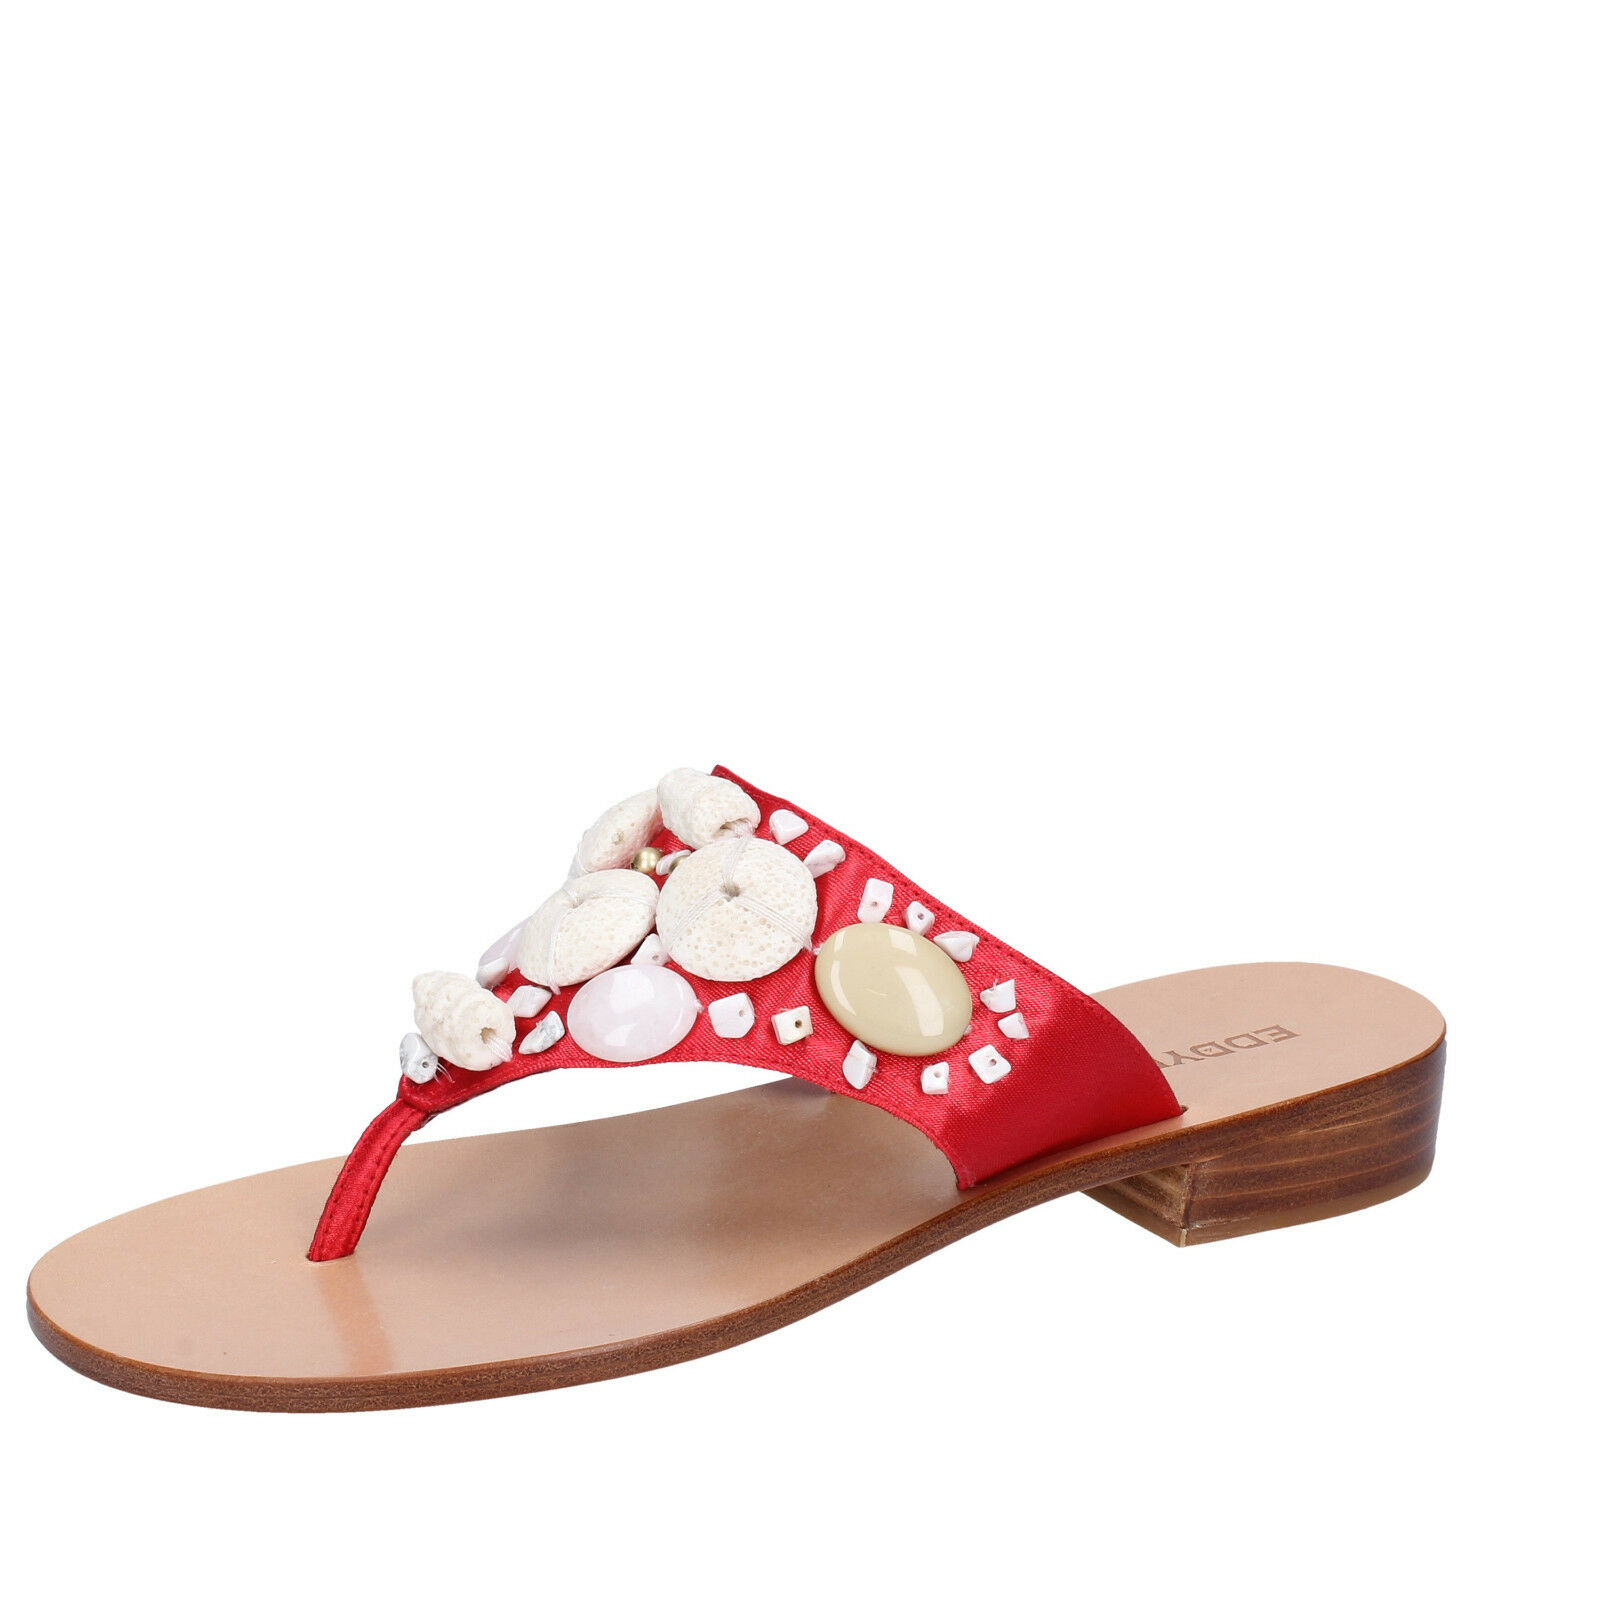 Para mujeres Zapatos Eddy Daniele 7 (EU 37) Sandalias Sandalias Sandalias Satén Rojo AW375-37  el estilo clásico